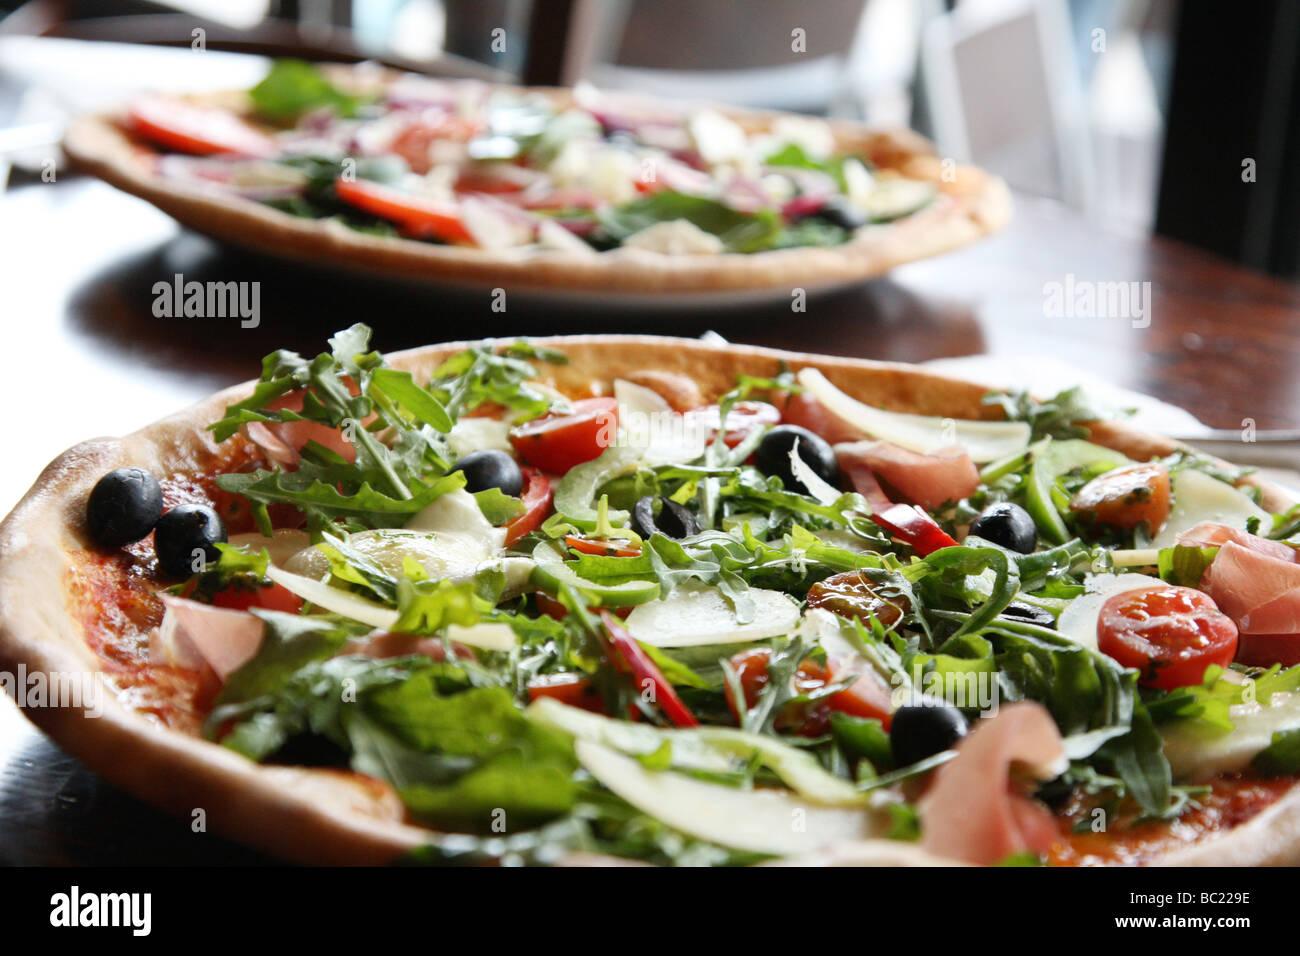 Dos pizzas que parezcan tentadores y deliciosos listos para comer. Corteza delgada horneada de piedra Imagen De Stock